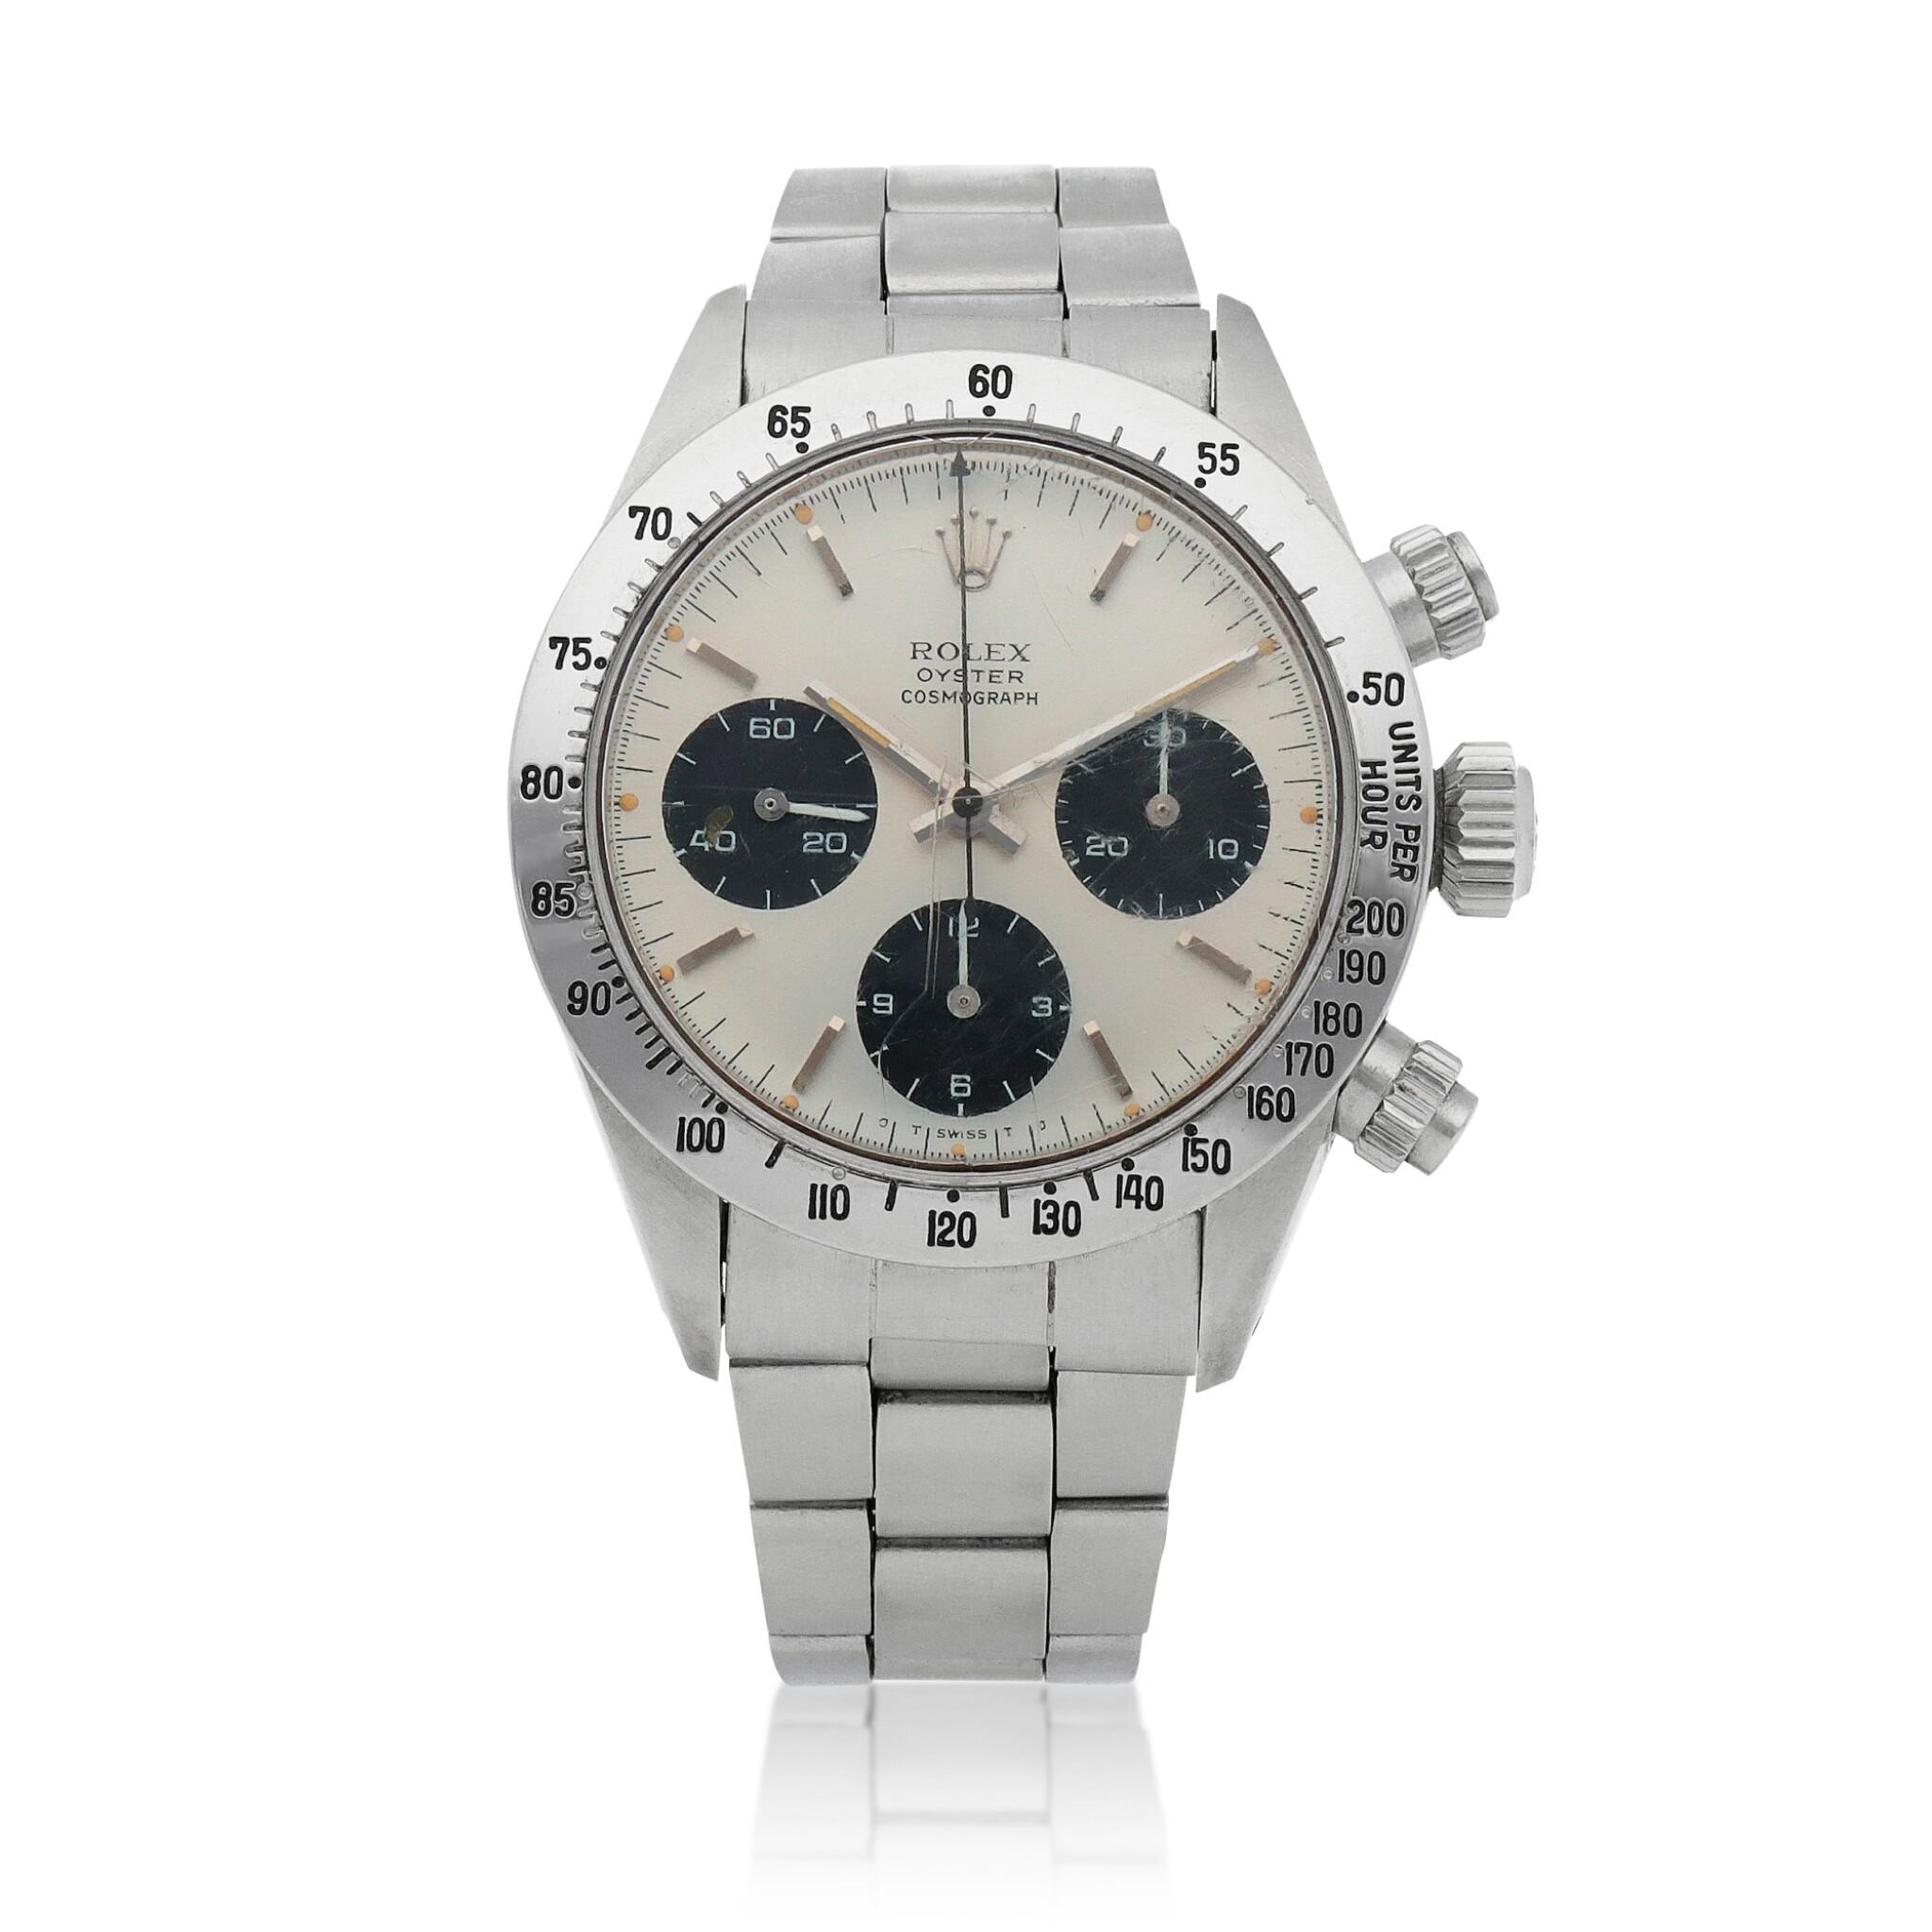 View full screen - View 1 of Lot 426. 'Sigma Dial' Daytona, Ref. 6265 Stainless steel chronograph wristwatch with bracelet Circa 1973 | 勞力士 6265型號「'Sigma Dial' Daytona」精鋼計時鍊帶腕錶,年份約1973.